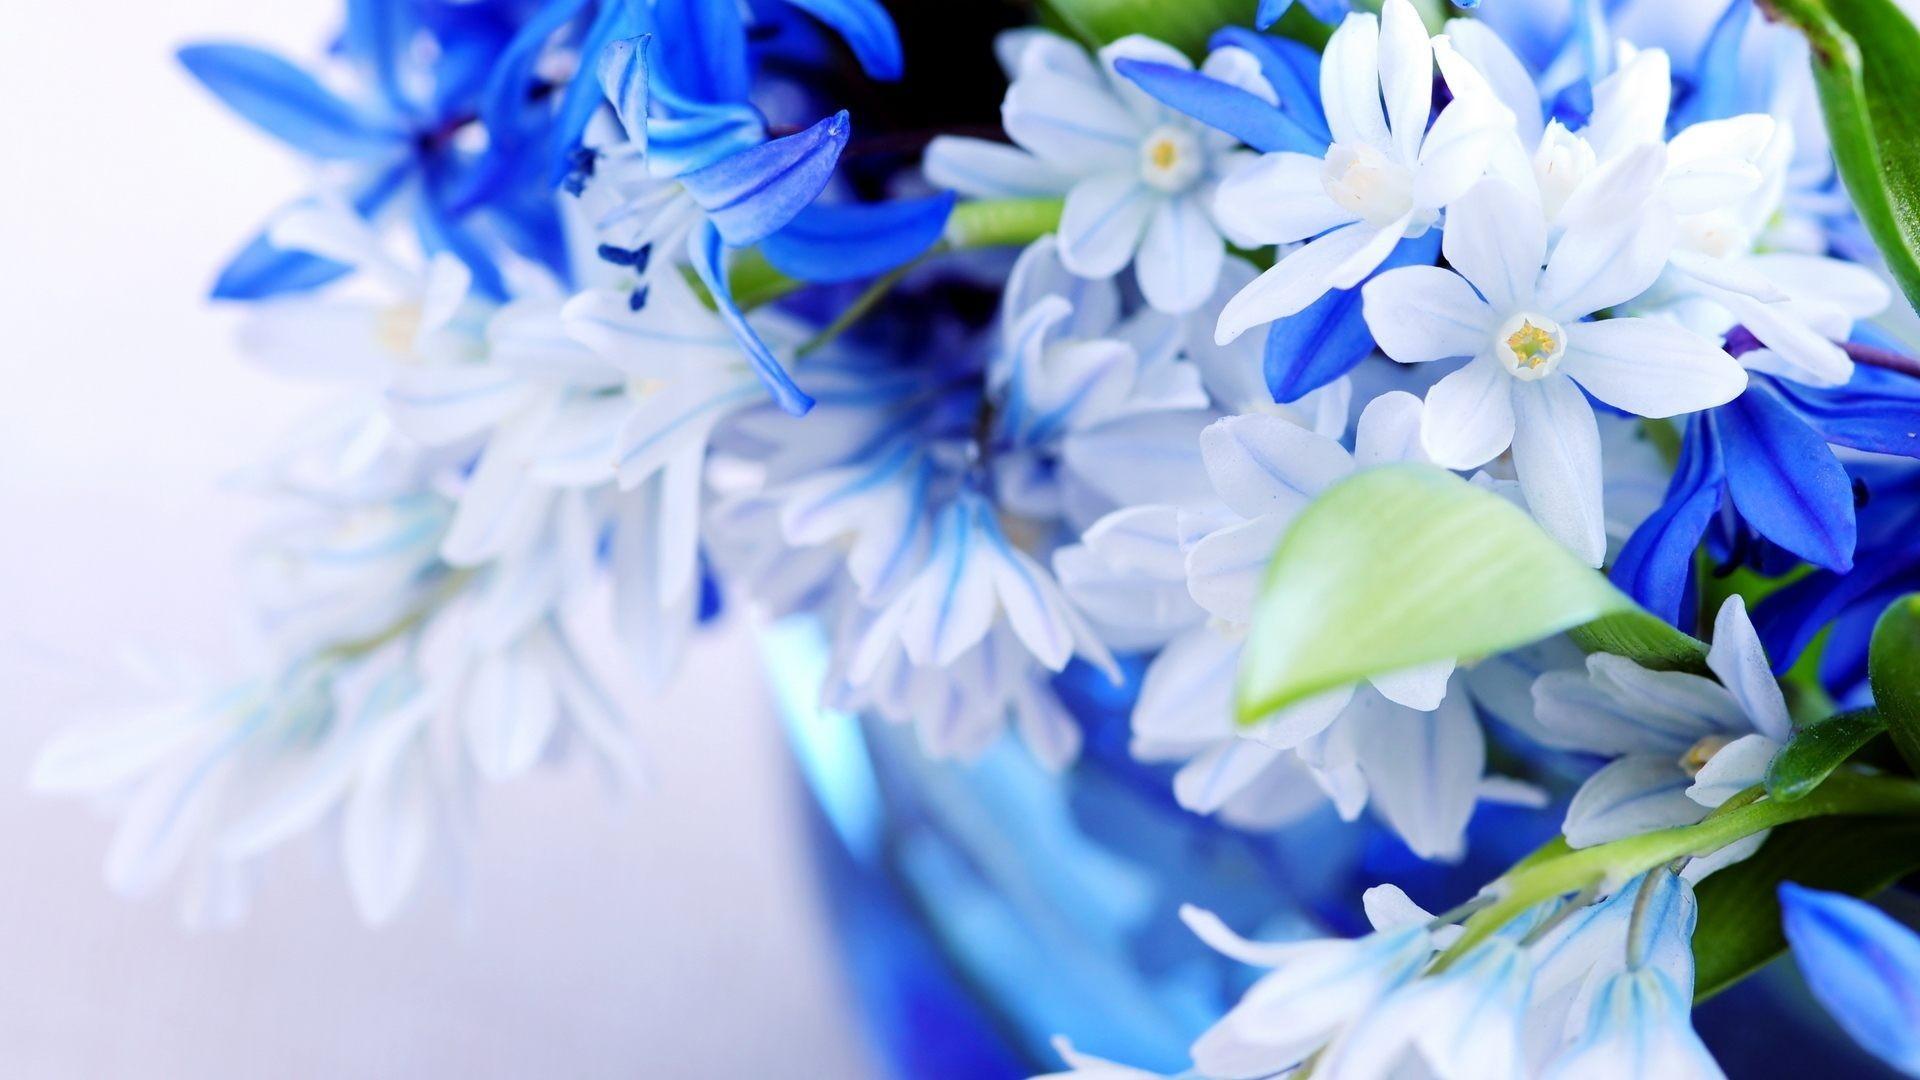 Res: 1920x1080, Blue Flower Background